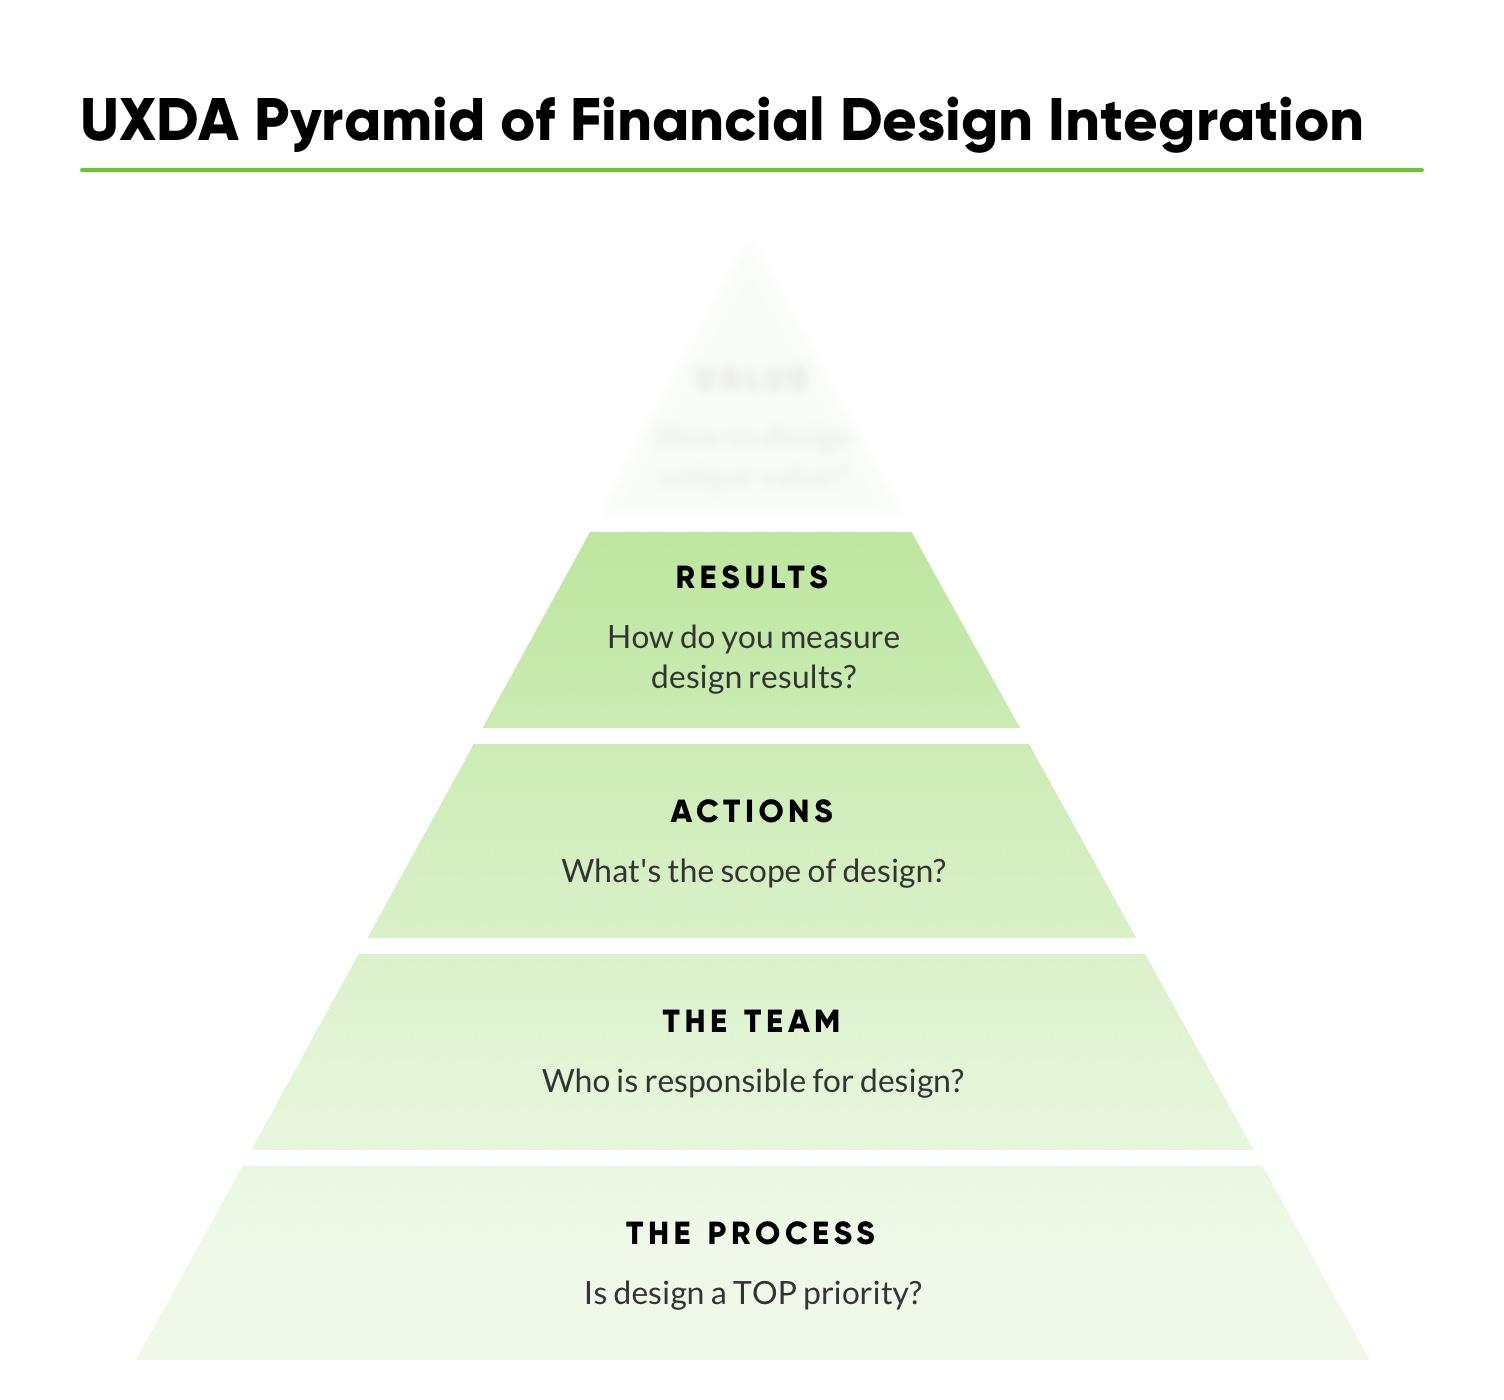 financial-ux-design-methodology-uxda-financial-design-integration-4-S.jpg